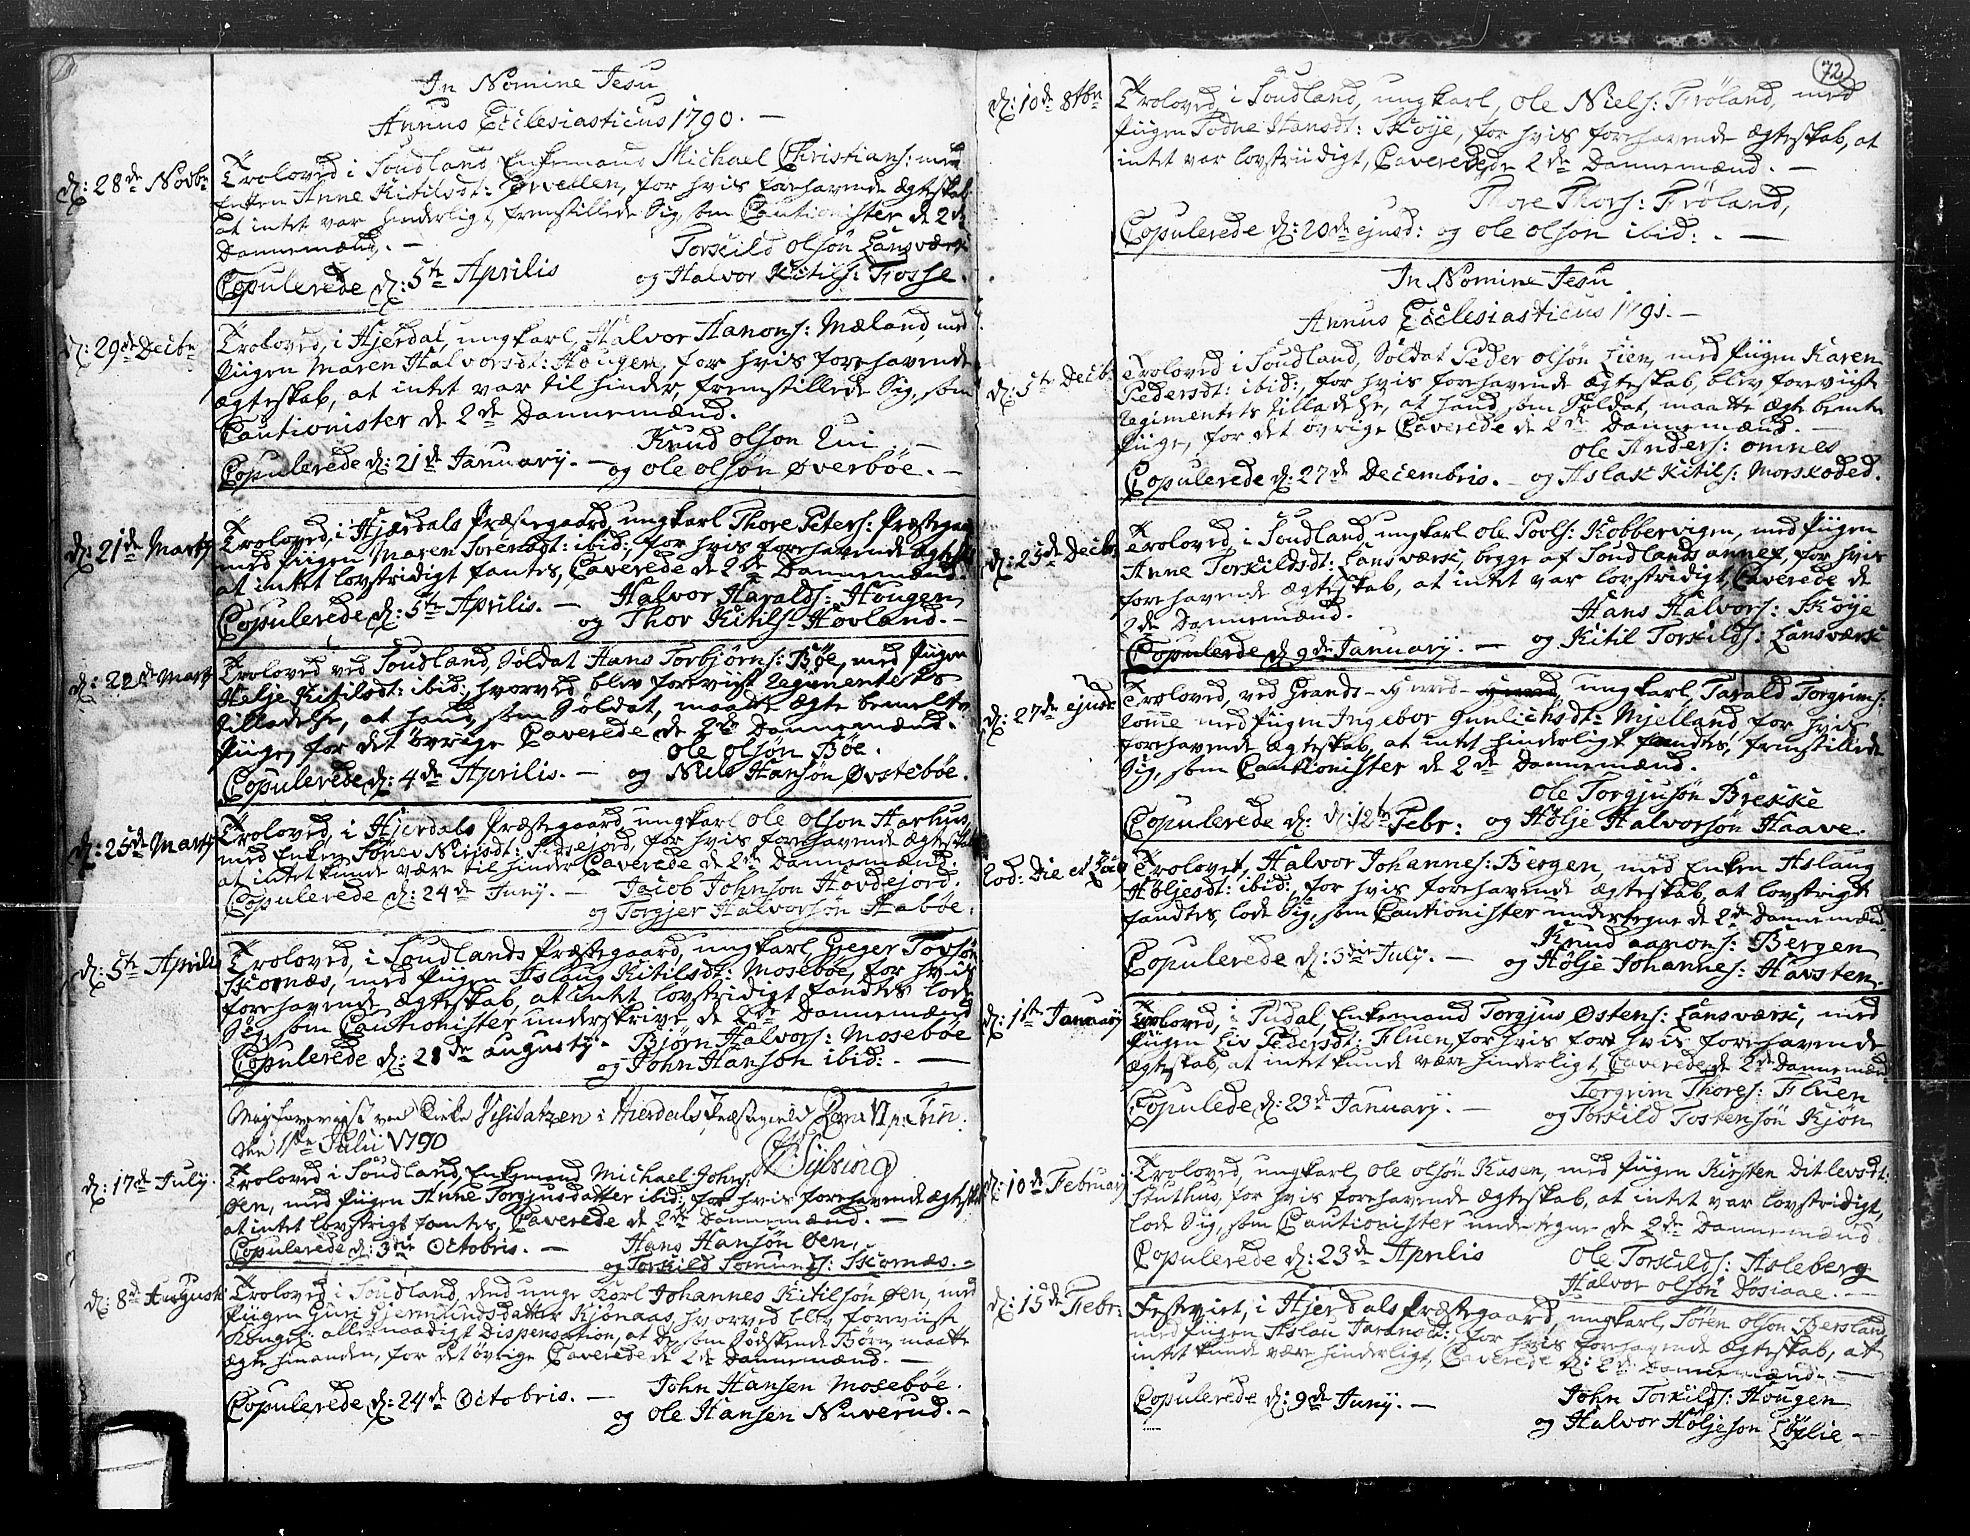 SAKO, Hjartdal kirkebøker, F/Fa/L0004: Ministerialbok nr. I 4, 1727-1795, s. 72